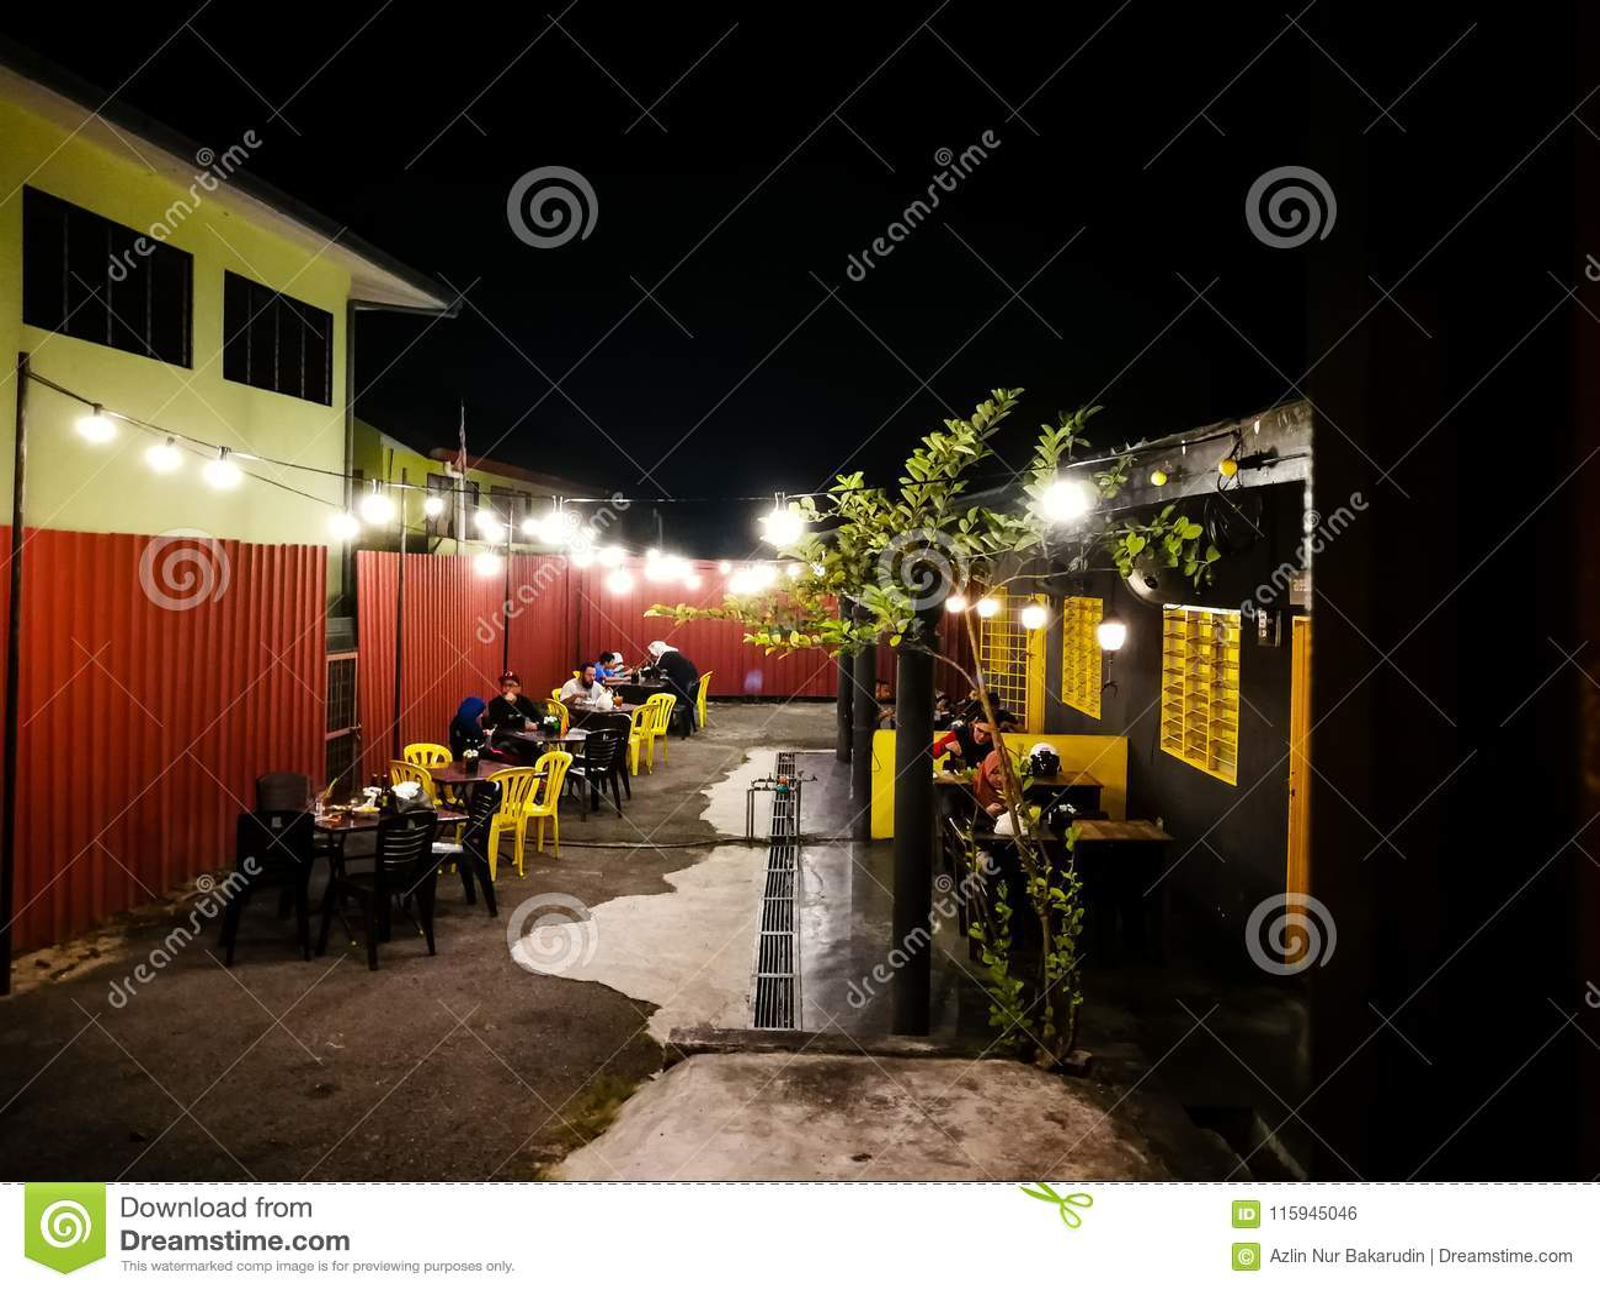 Clientes que cenan en el restaurante del garaje de Mixwell, Sungai Tangkas, Kajang